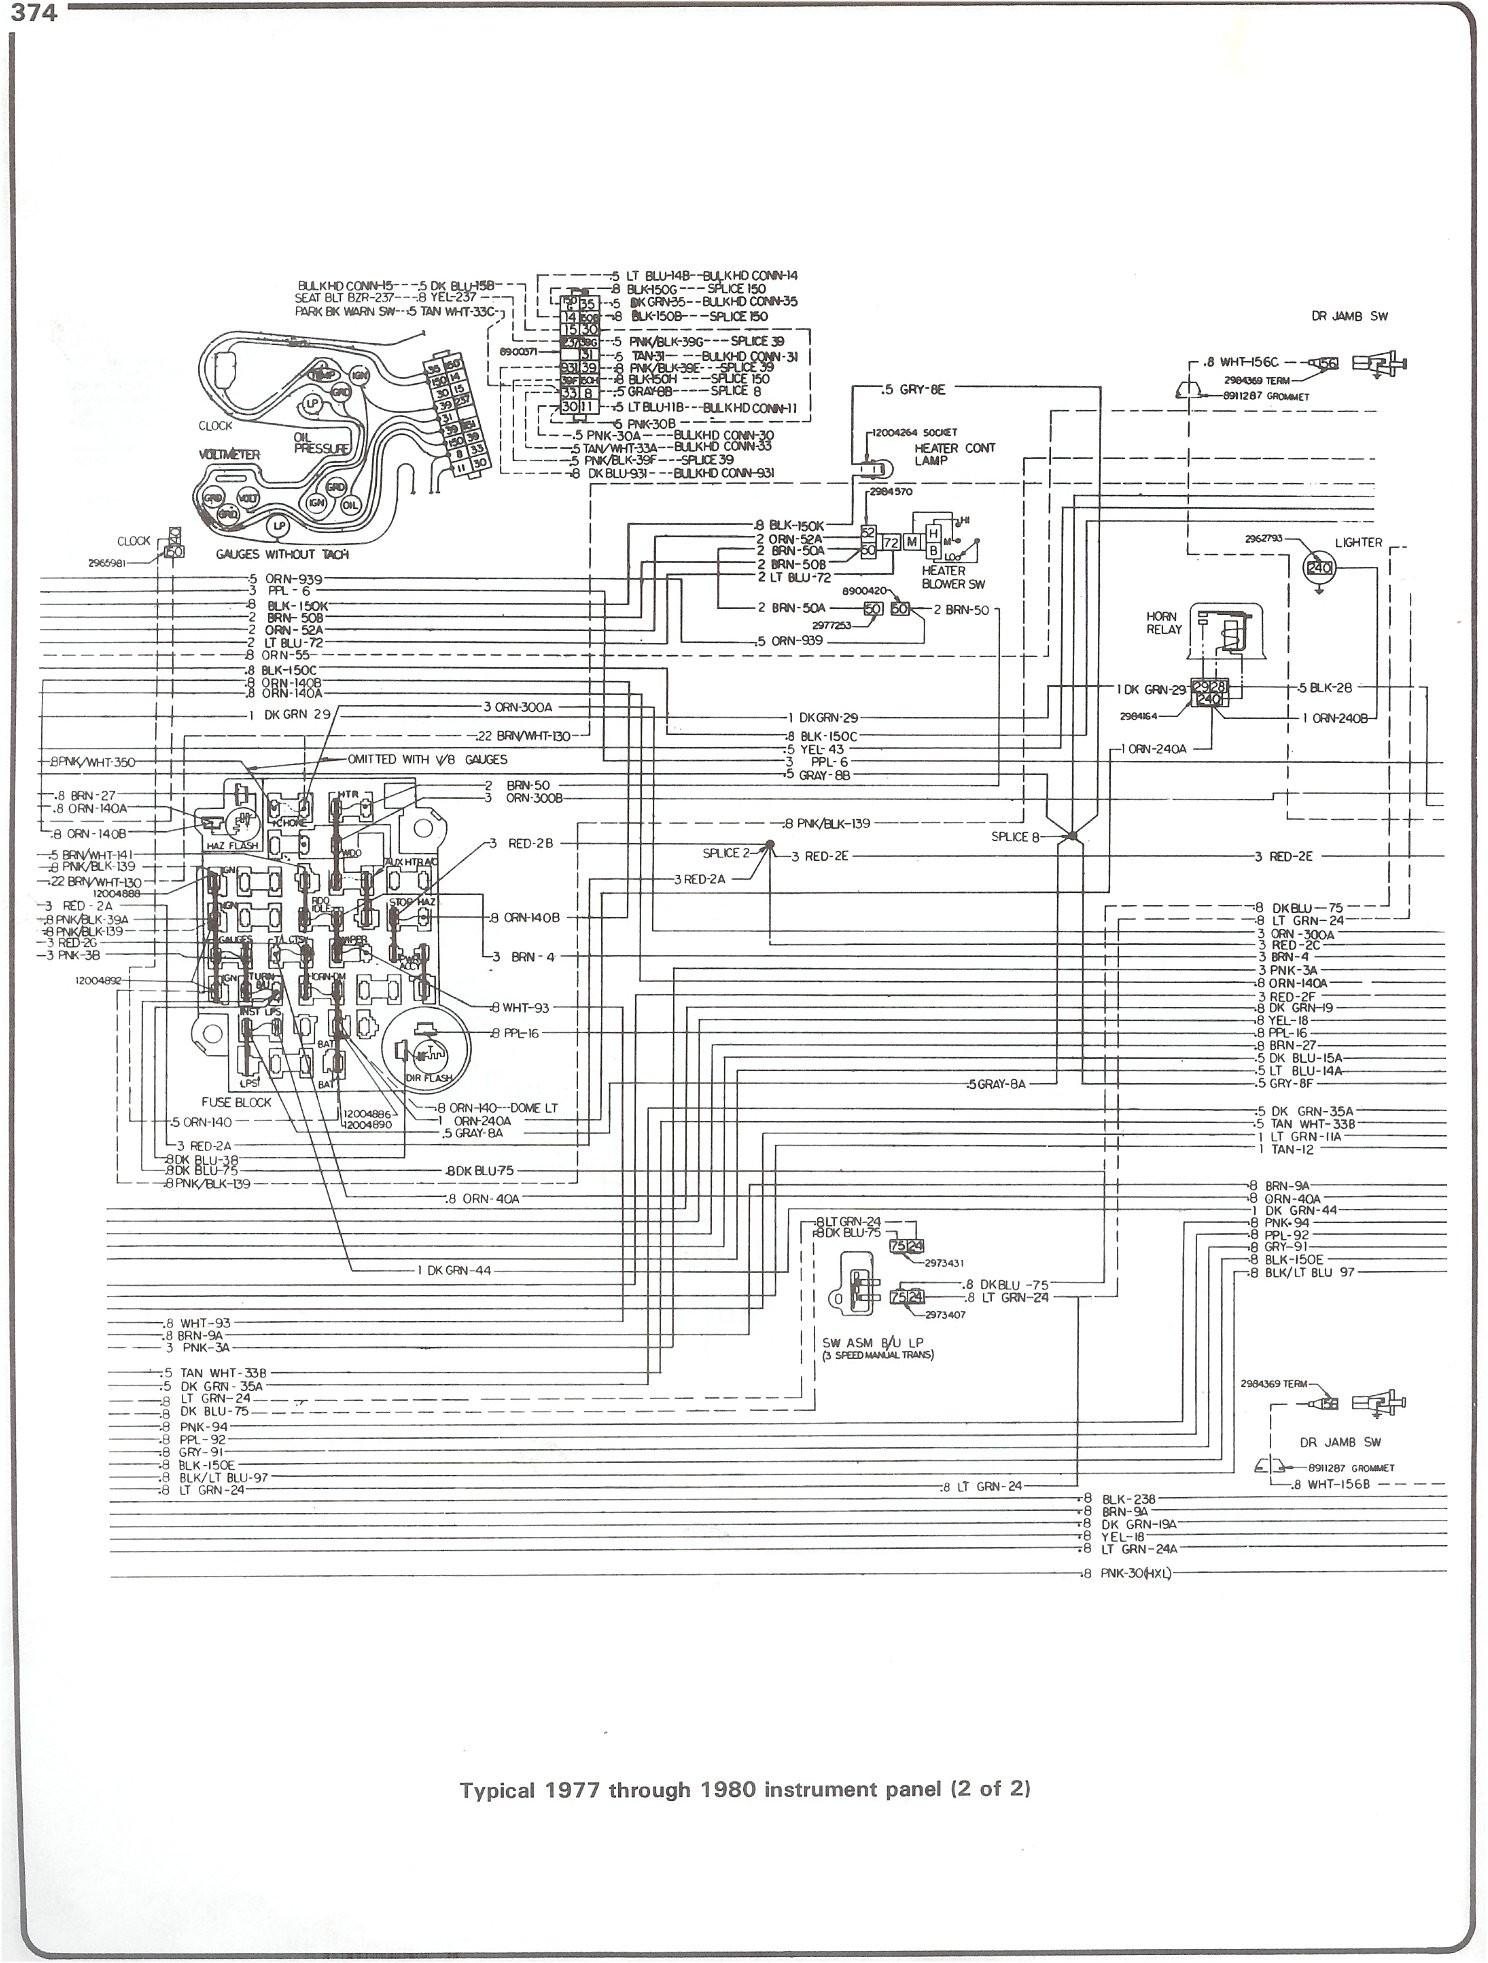 Chevy S10 Parts Diagram 2012 2016 2l 2s03 06 43 Engine Asm 2 4l L4 350 Piston 78 Starter Wiring Of